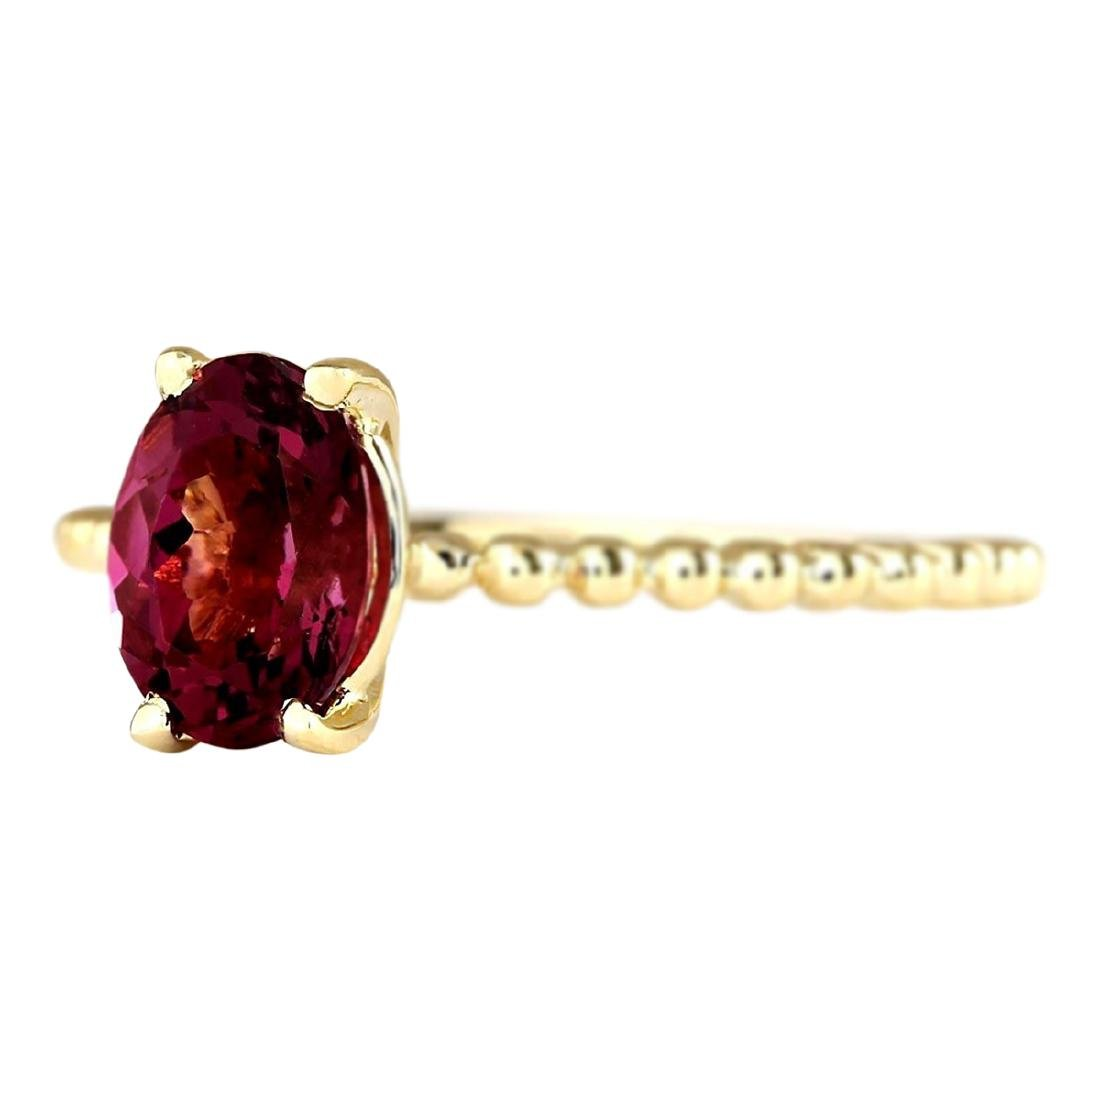 1.31 CTW Natural Pink Tourmaline Ring In 18K Yellow - 2